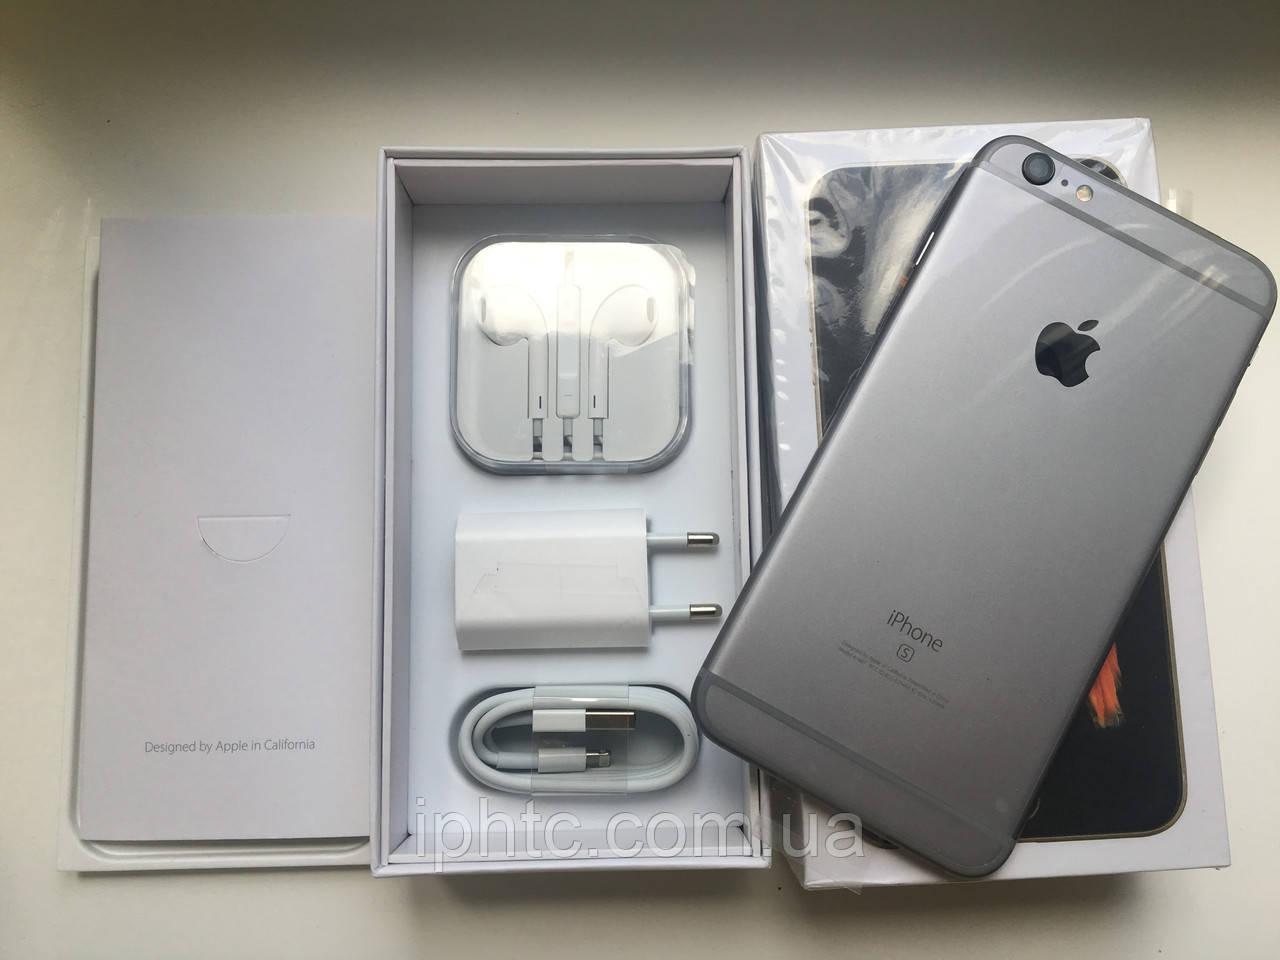 Apple iPhone 6S Plus 64GB Grey /Новый (RFB) / NeverLock Запечатан